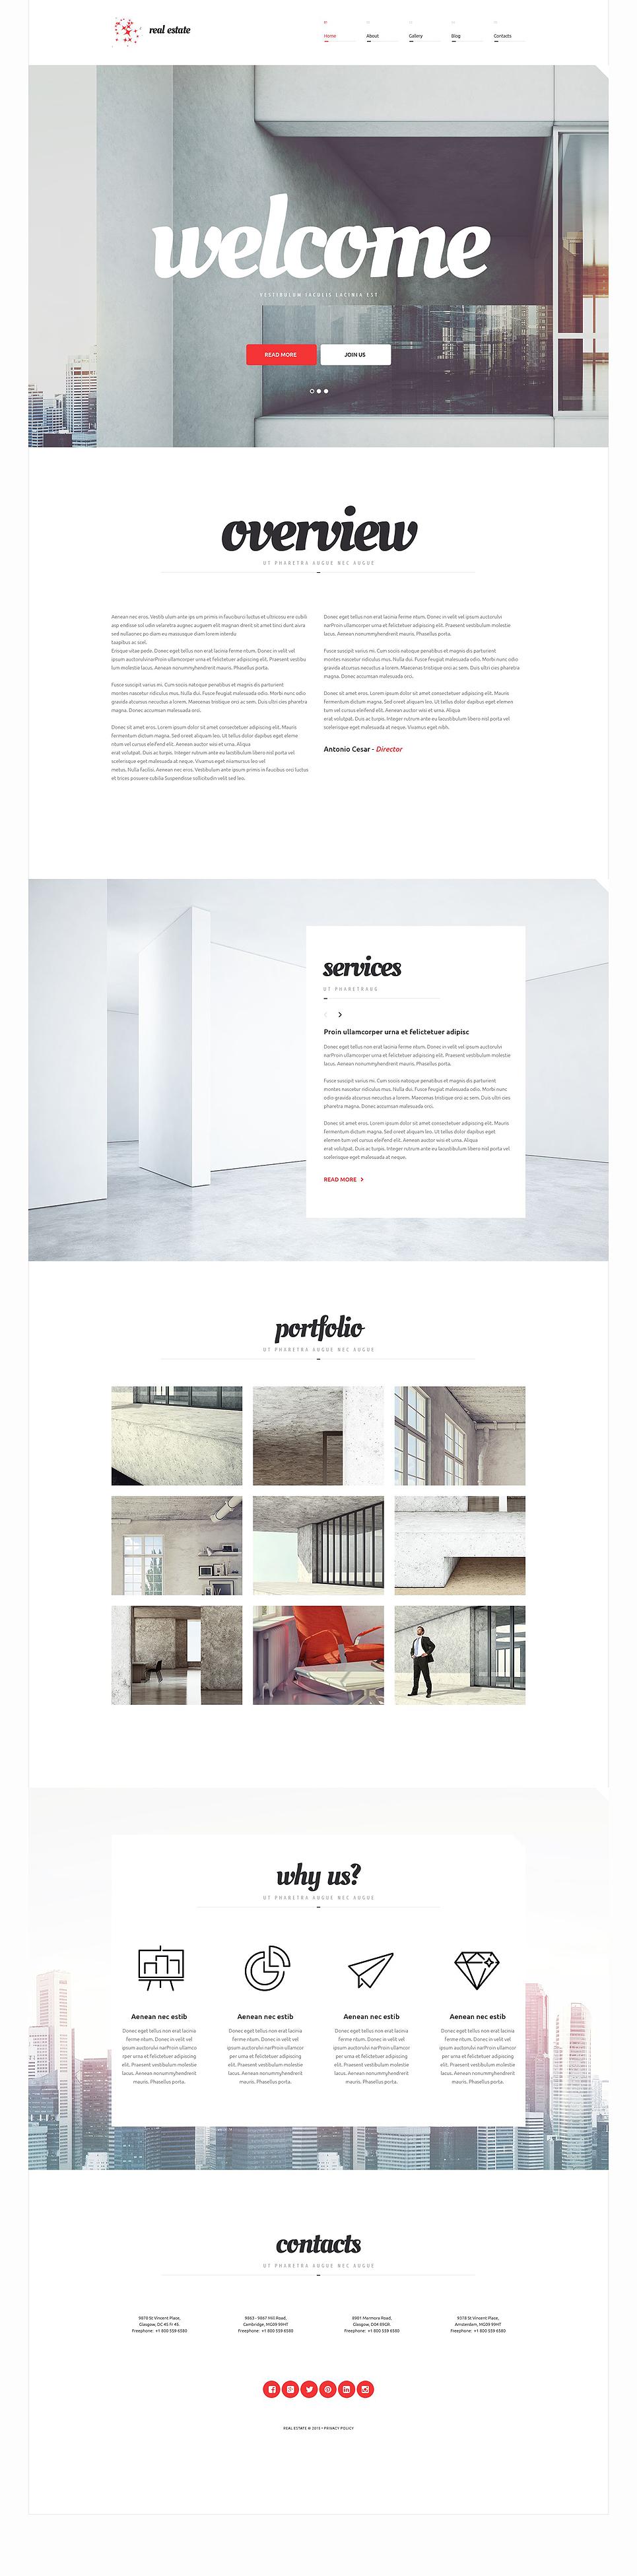 Адаптивный шаблон сайта на тему агентство недвижимости #54654